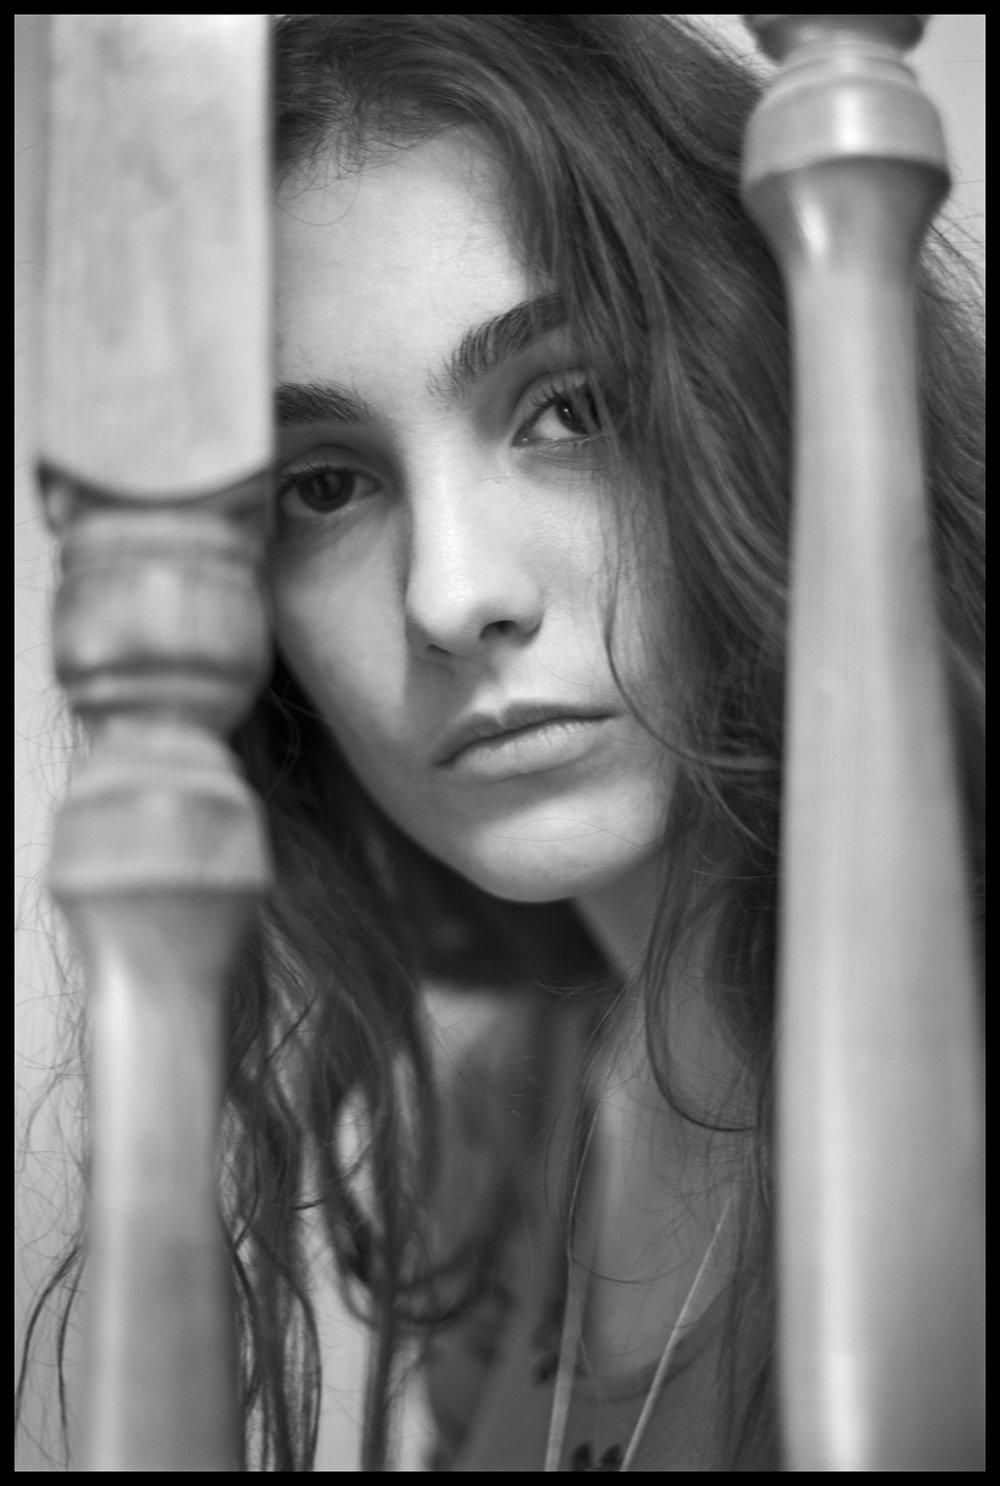 b986c07d56a9-Polina_8, model citizen magazine.jpg